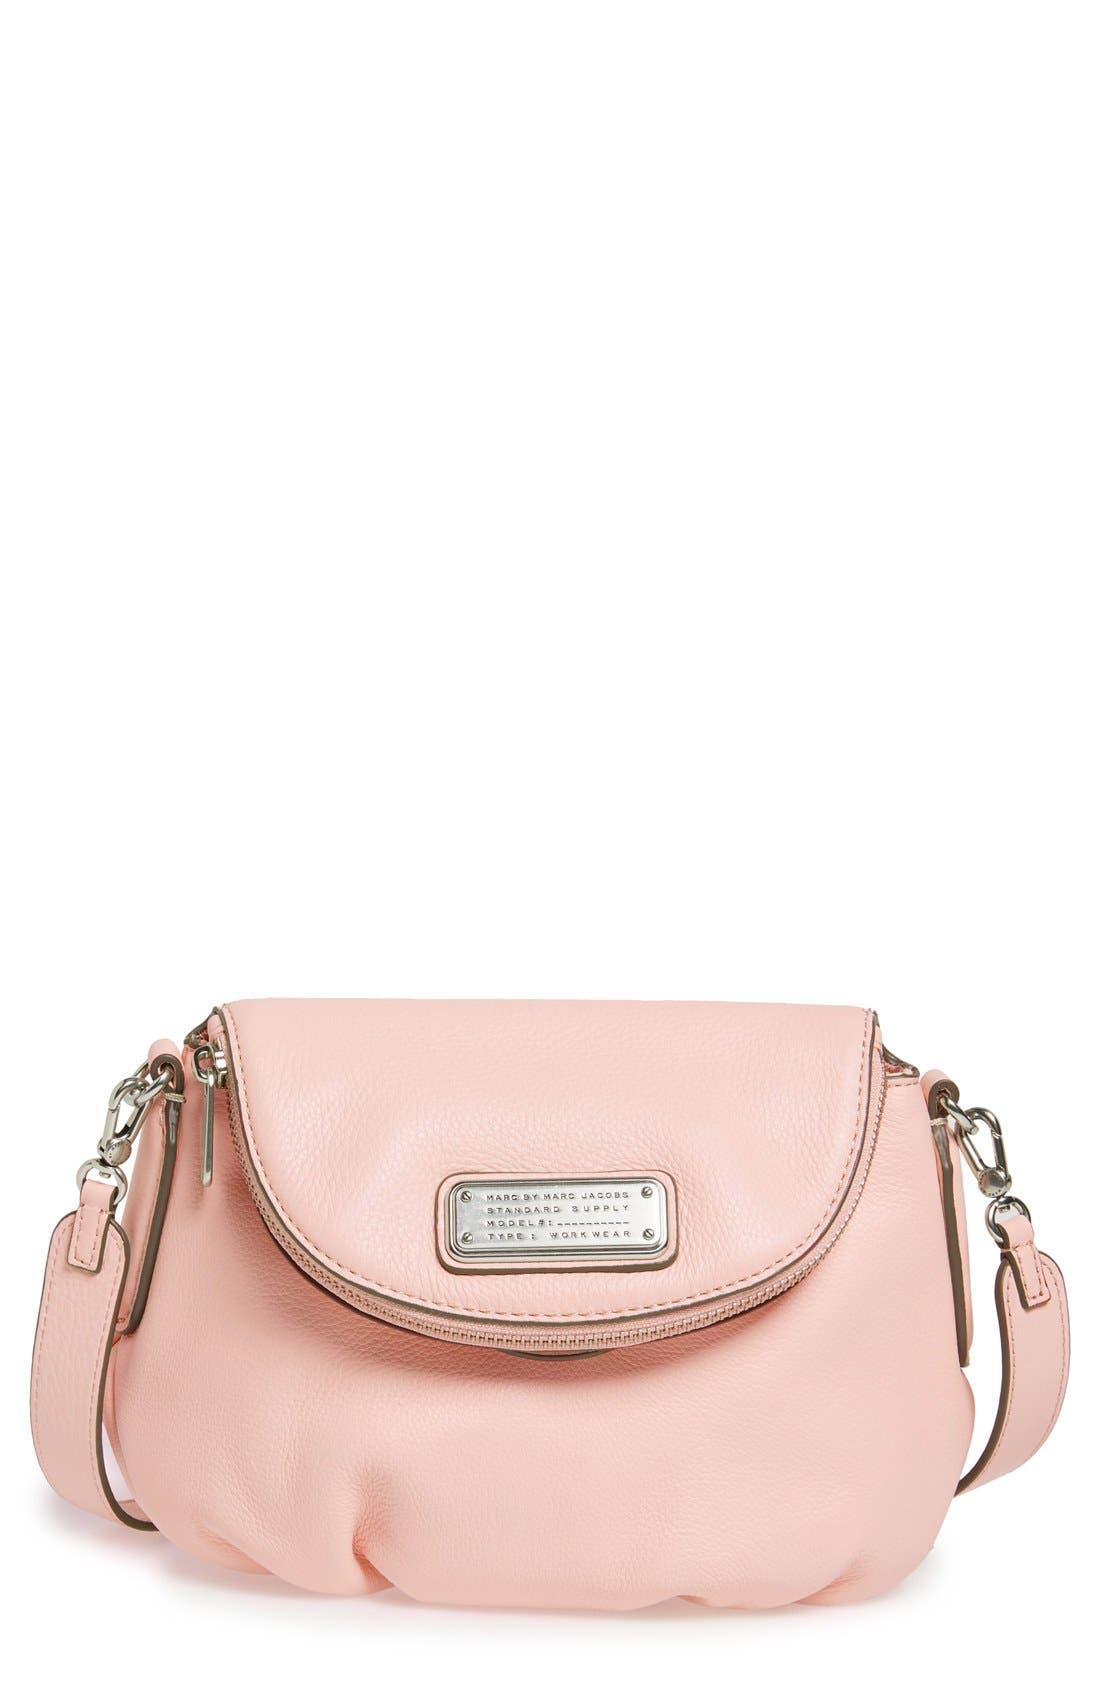 Alternate Image 1 Selected - MARC BY MARC JACOBS 'New Q - Mini Natasha' Crossbody Bag